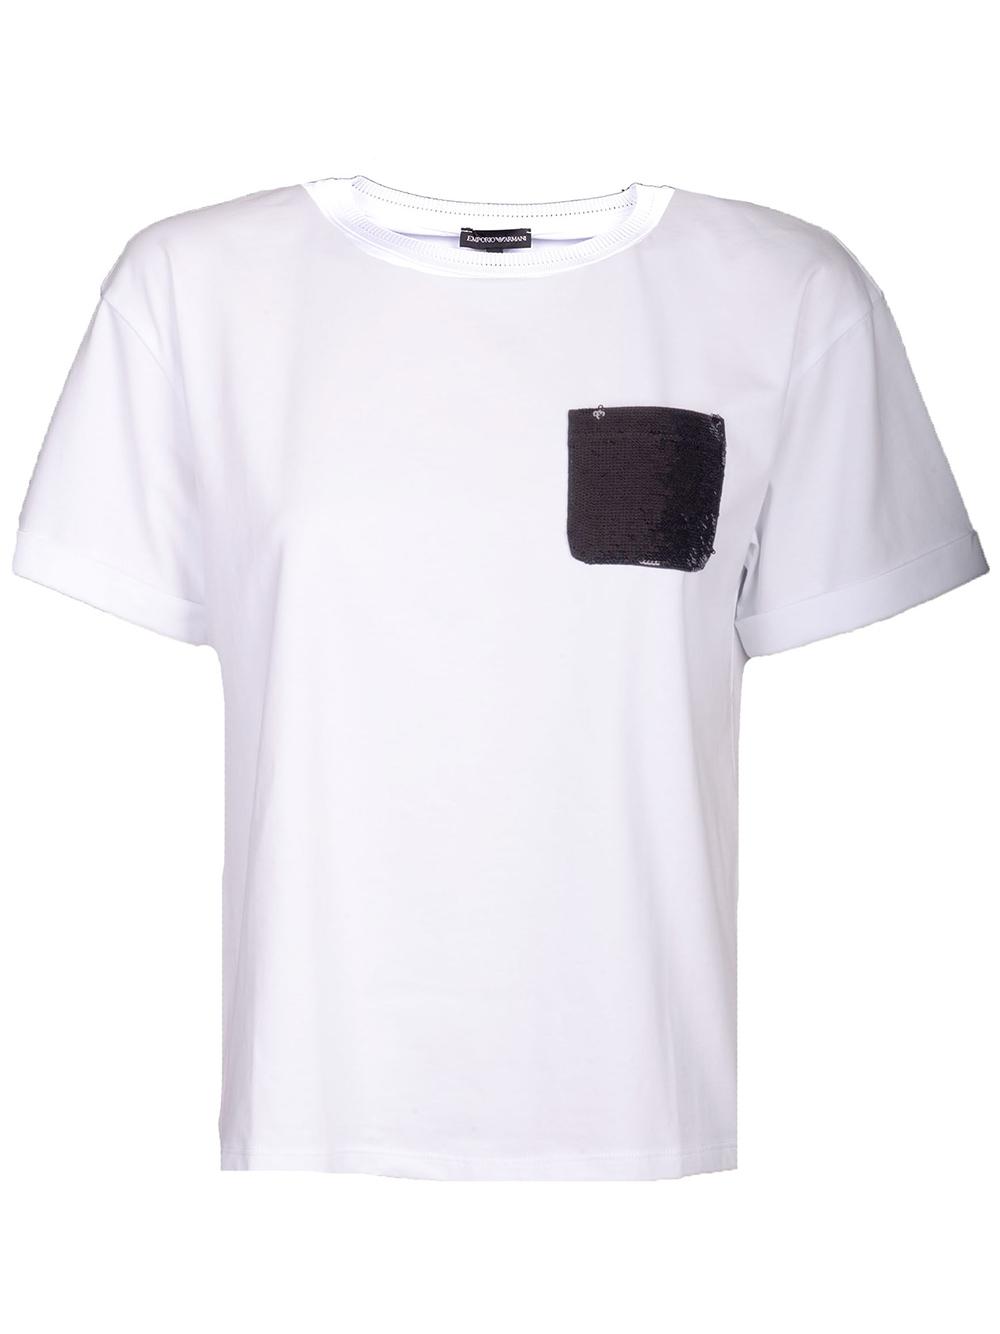 EMPORIO ARMANI Μπλούζα T-Shirt 3G2T84 2JQAZ ΛΕΥΚΟ